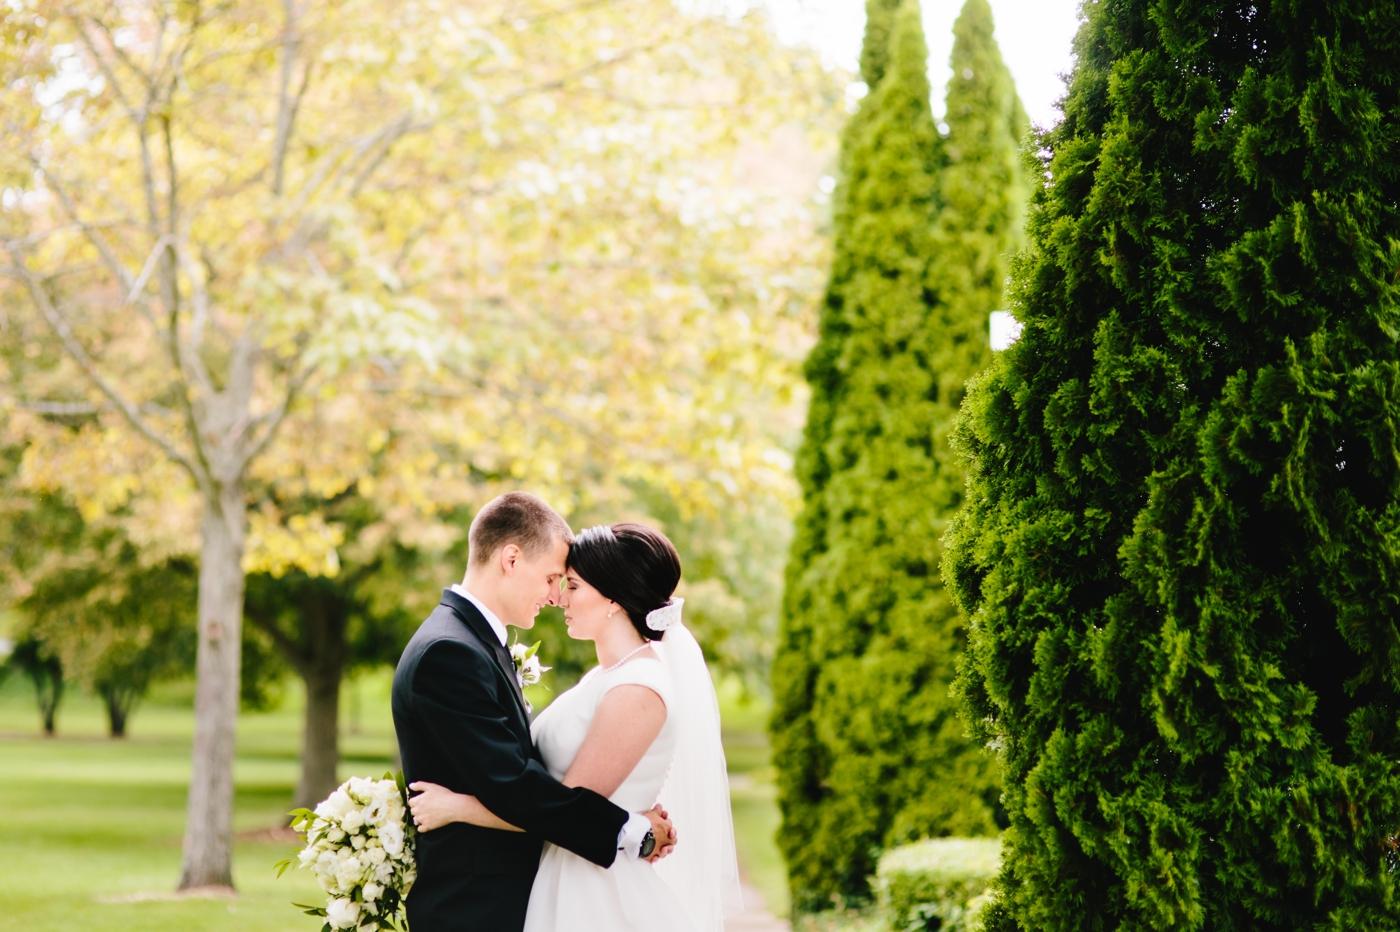 chicago-fine-art-wedding-photography-mccarthy35